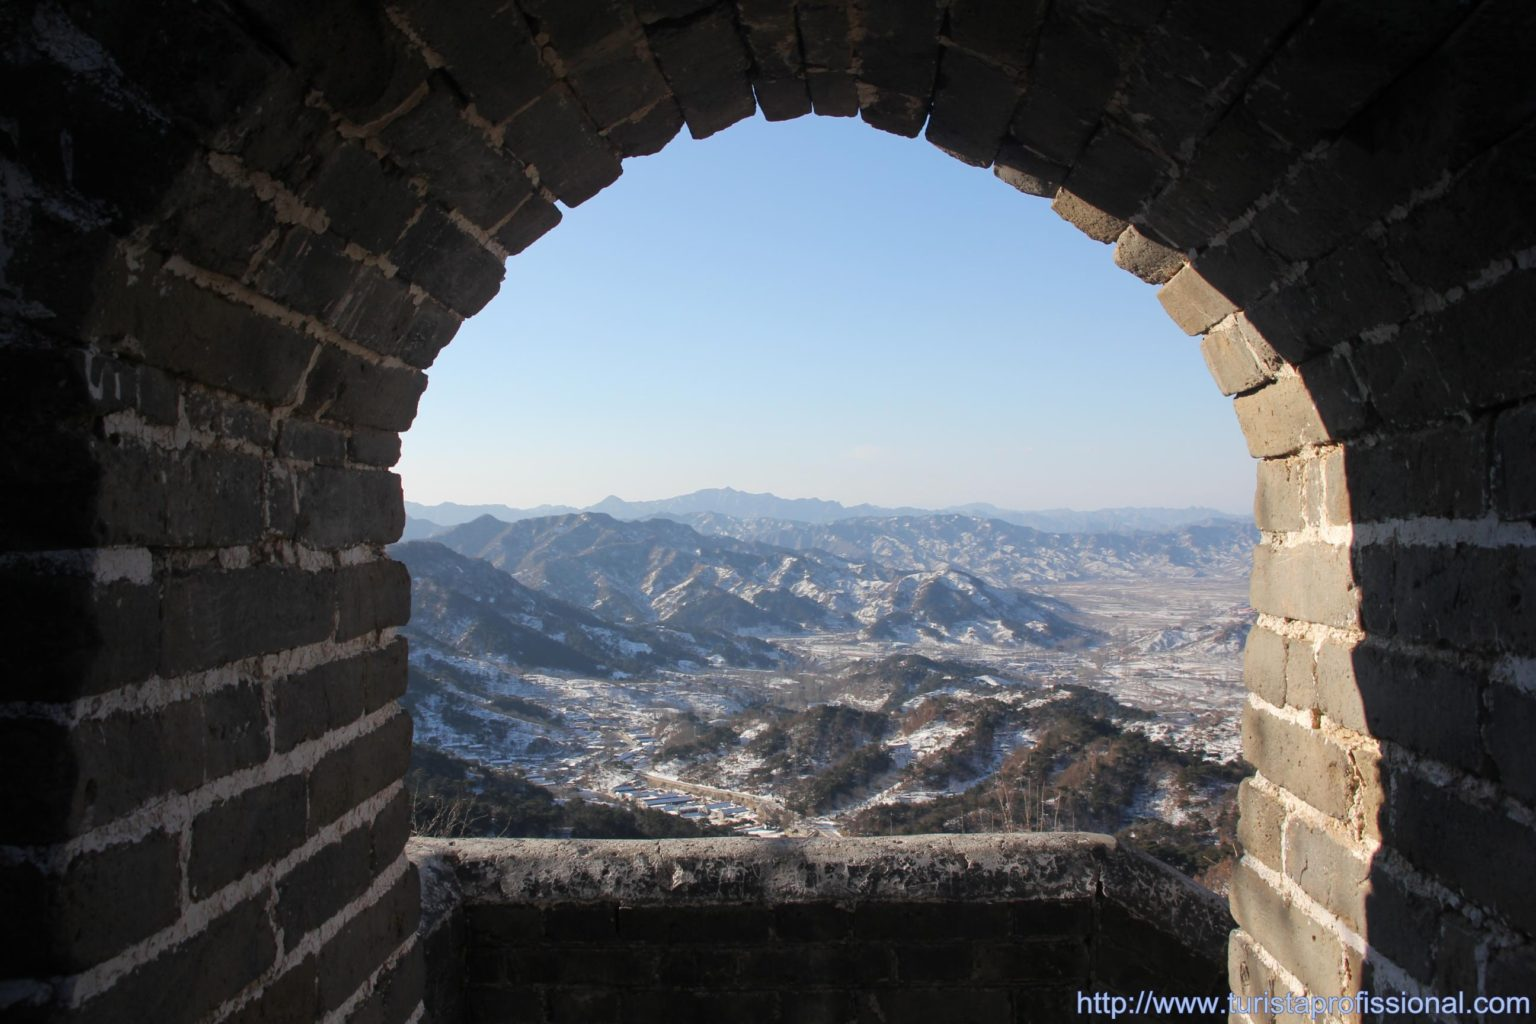 Muralha da China 12 - Olhares | Muralha da China